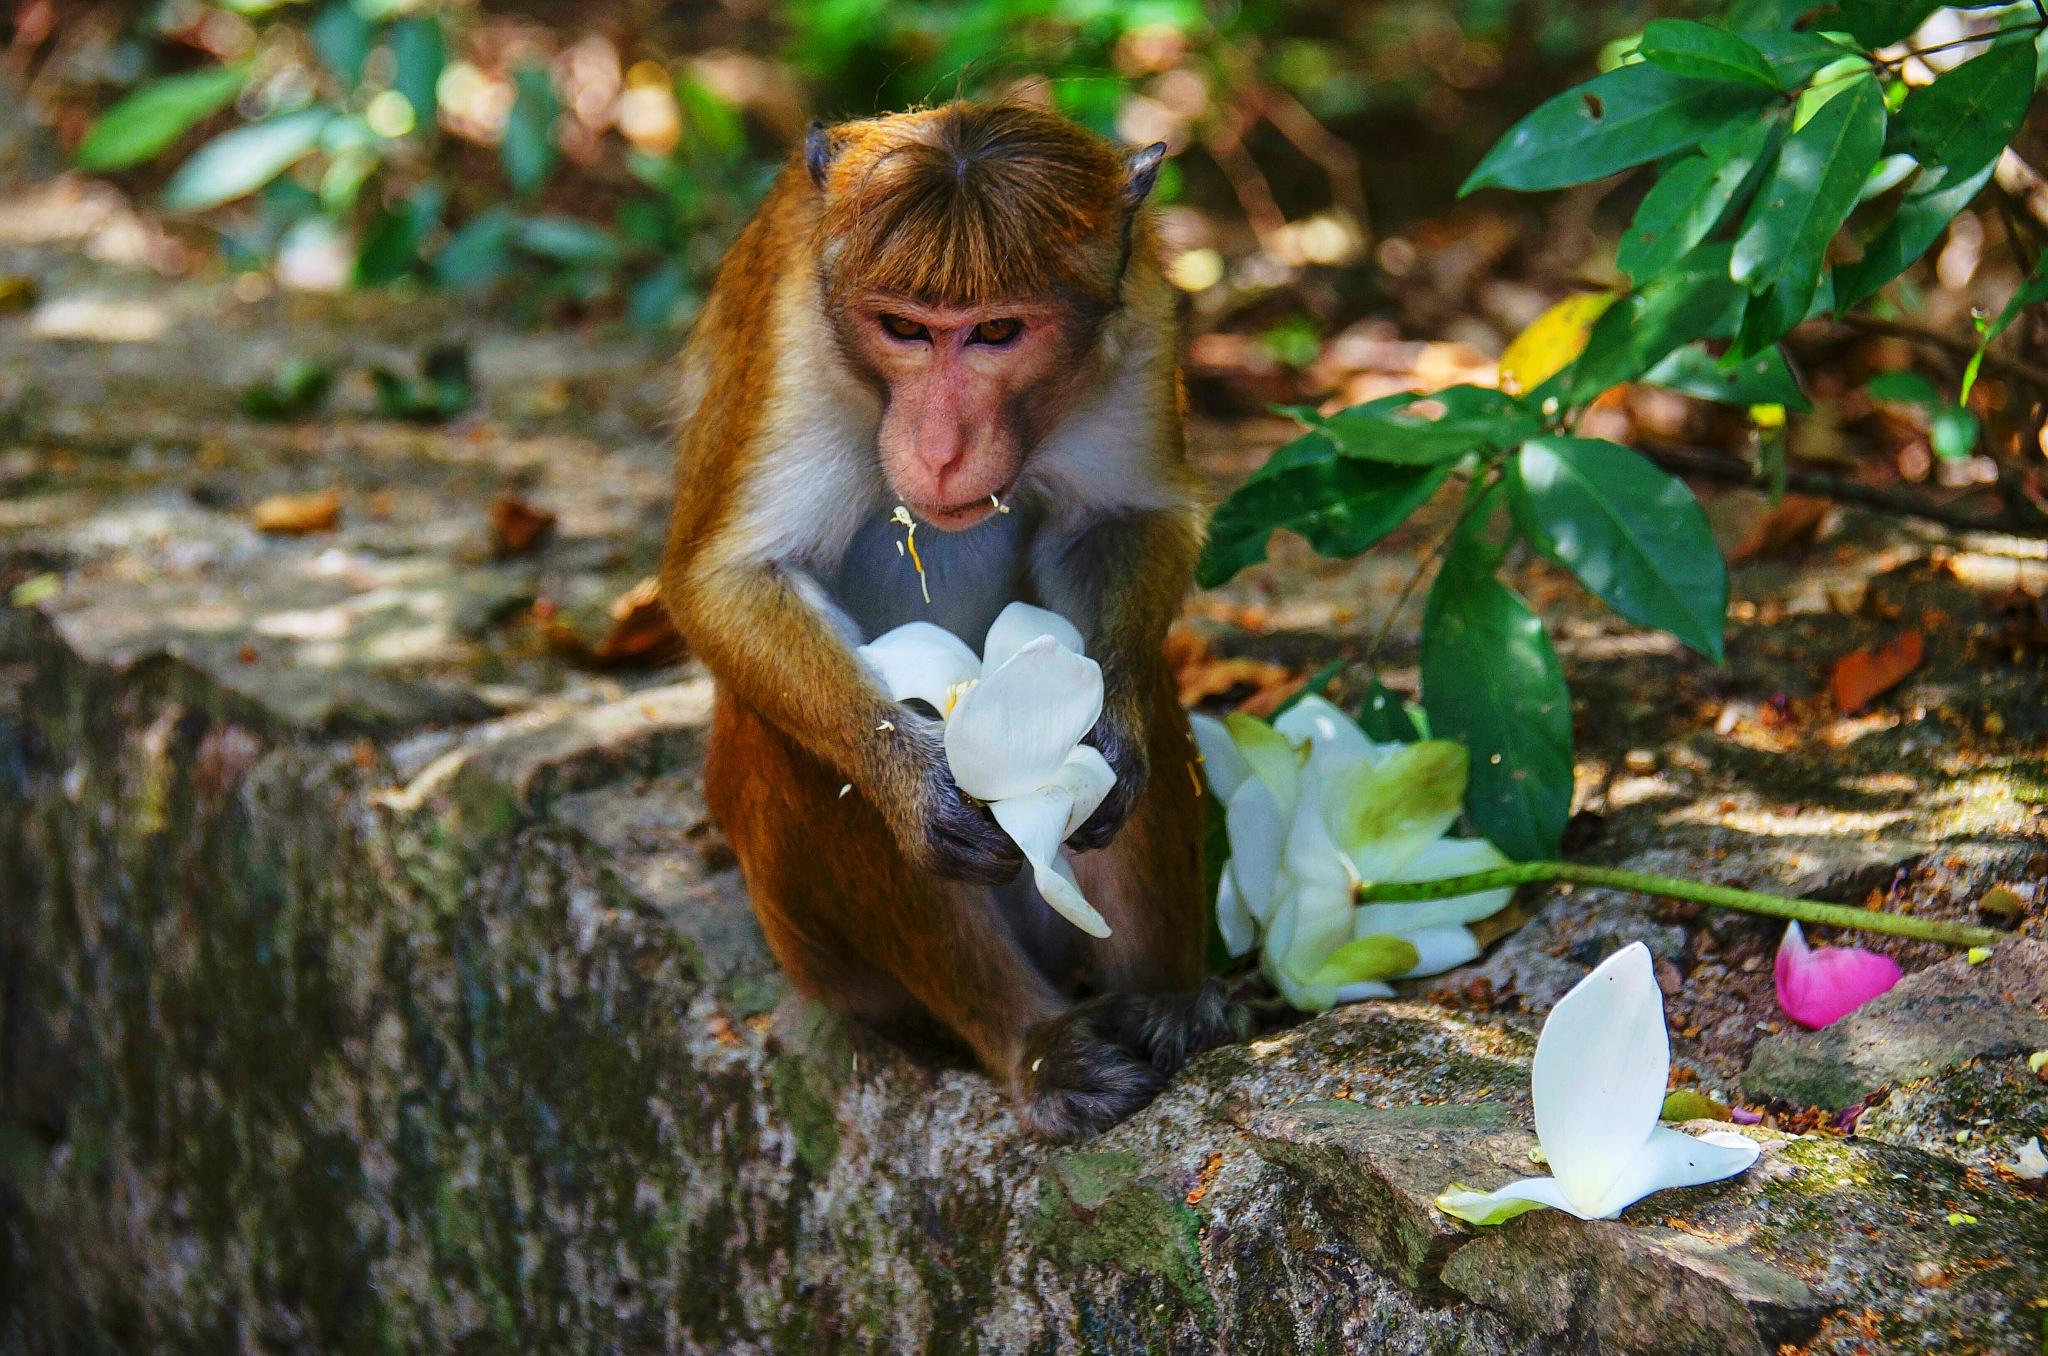 Monkey and Flowers by sergey.parfeniuk